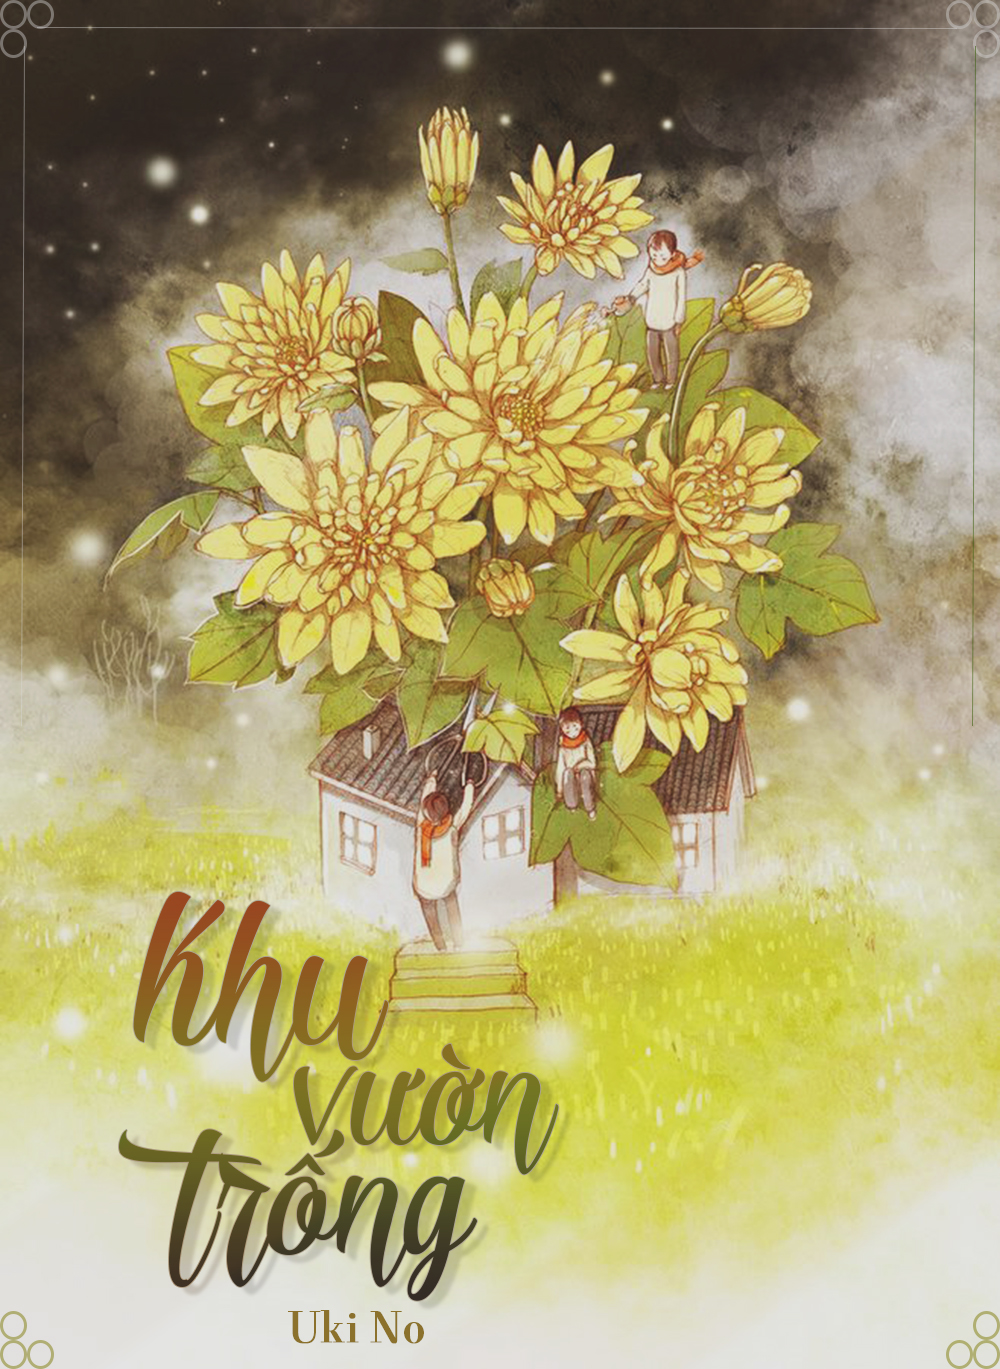 [Light Novel] Khu vườn trống